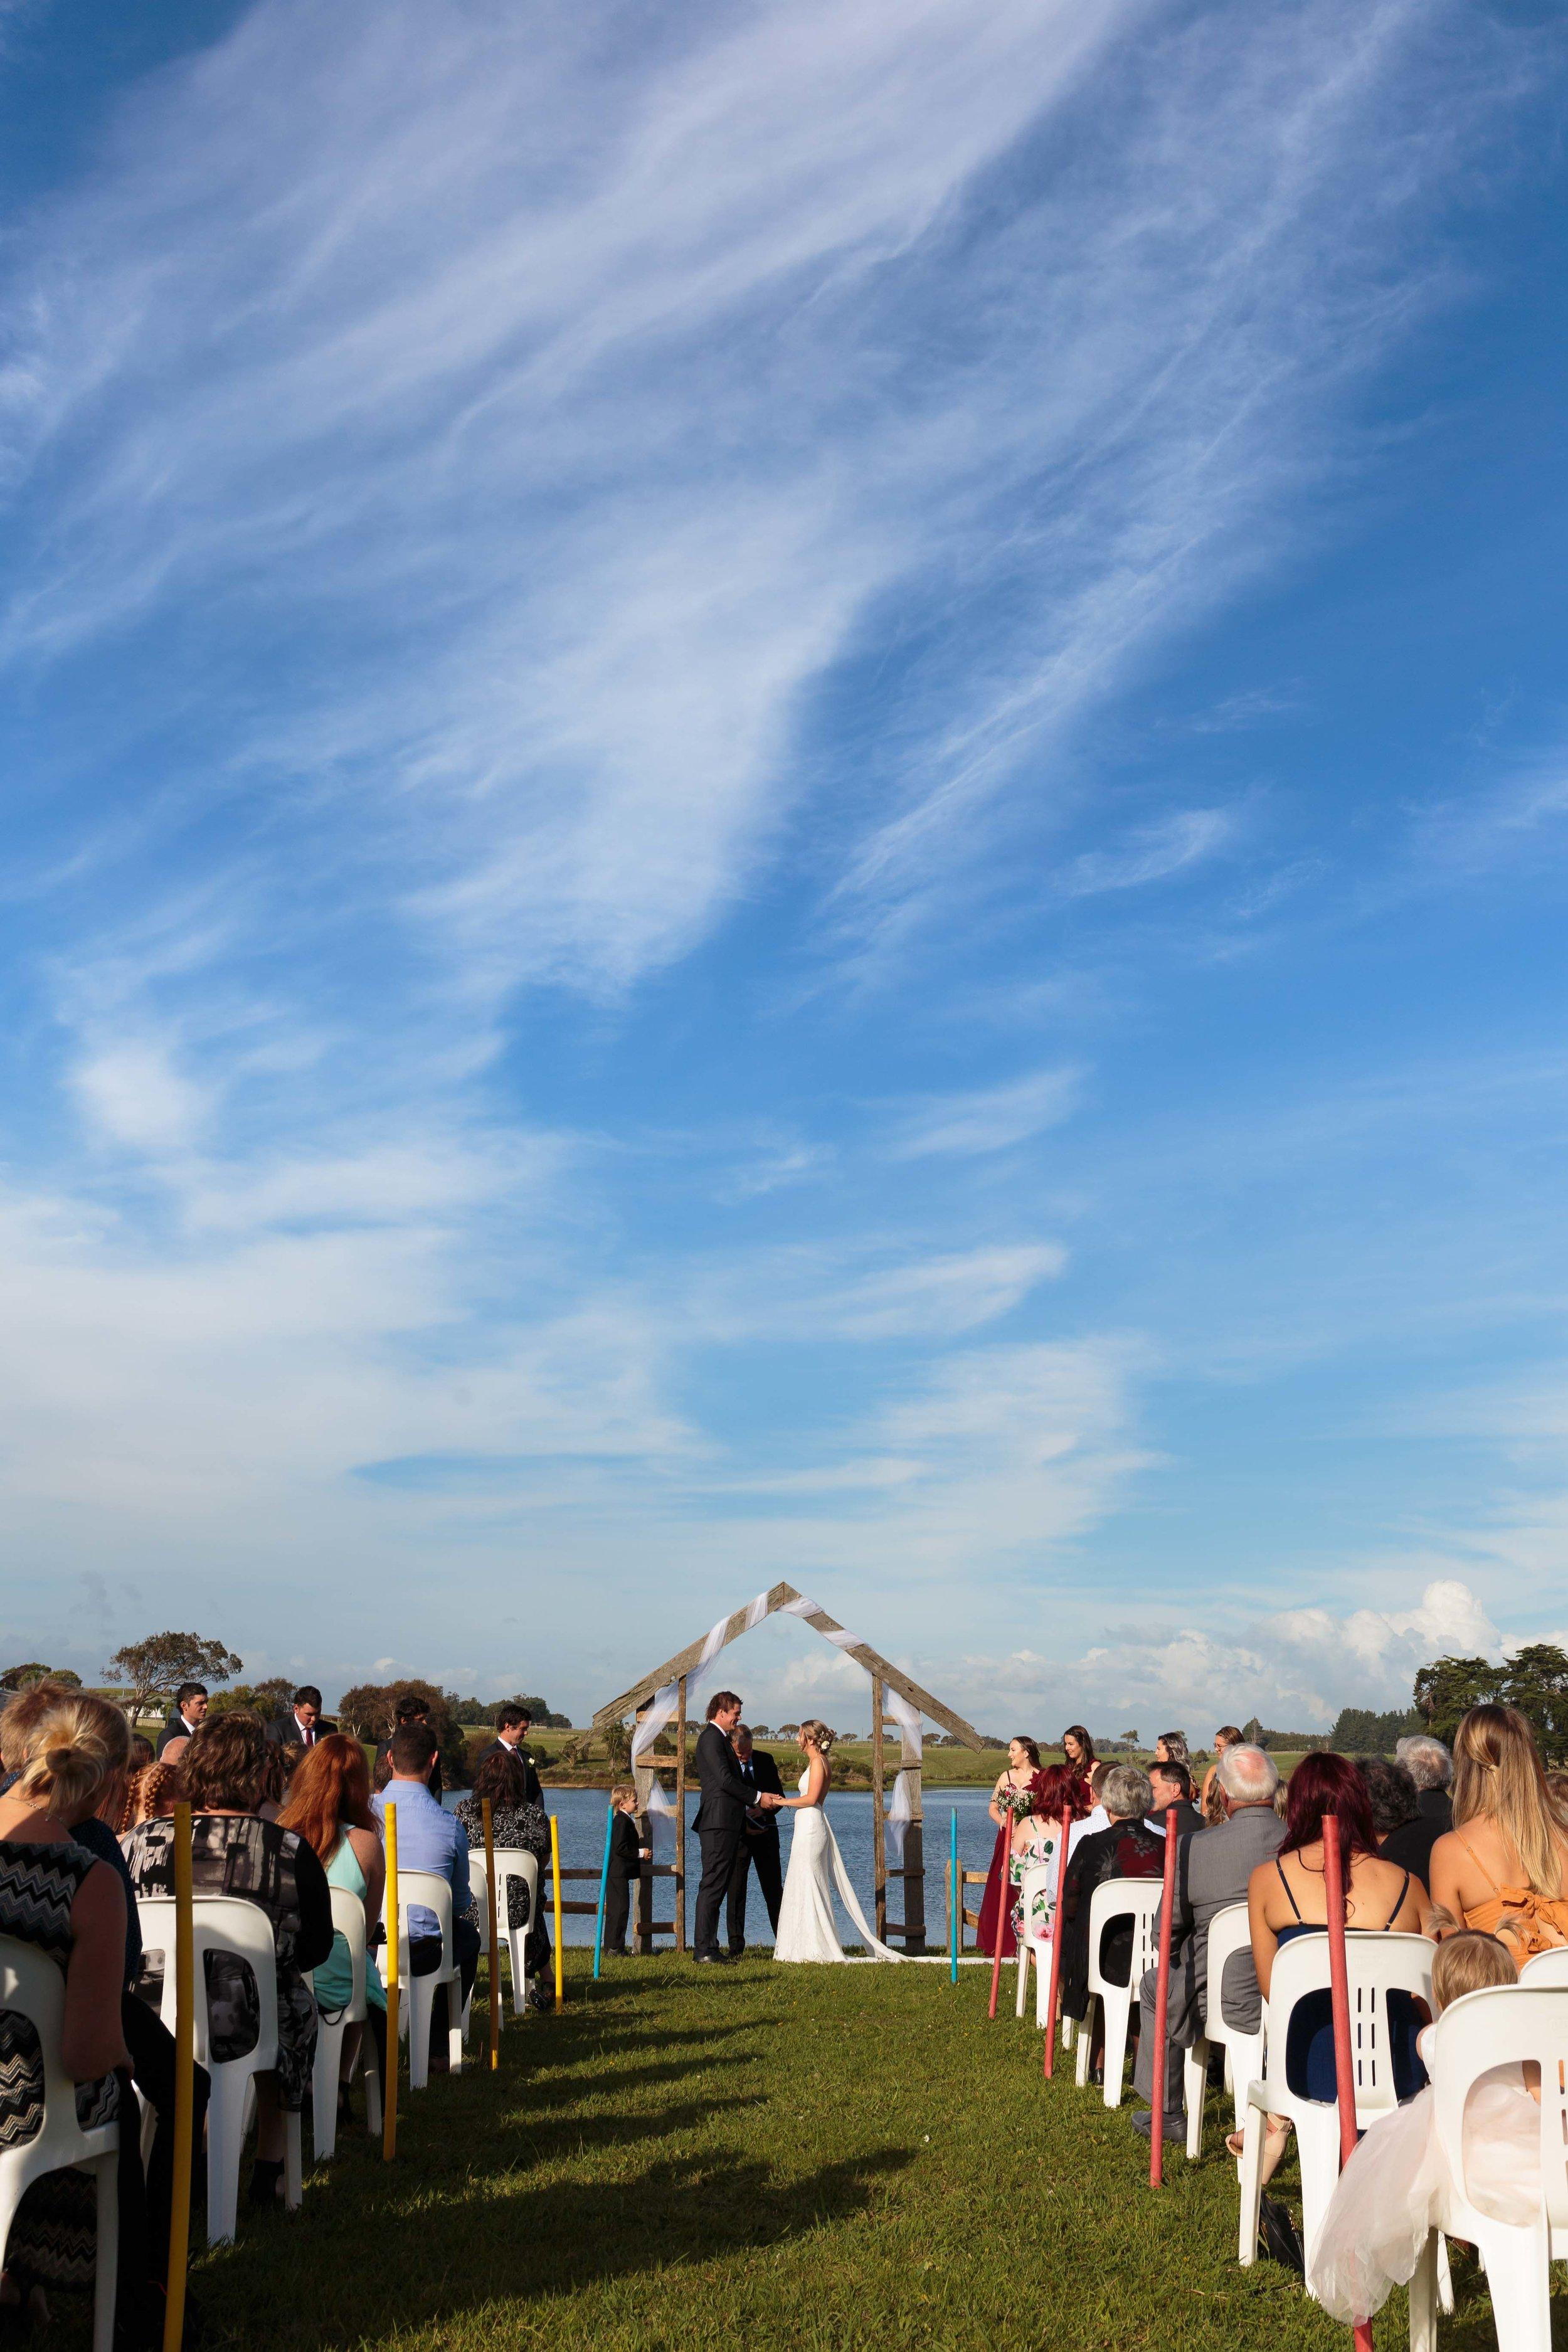 Highight-wedding-photography-dudding-lake-palmerston-north-new-zealand-35.jpg